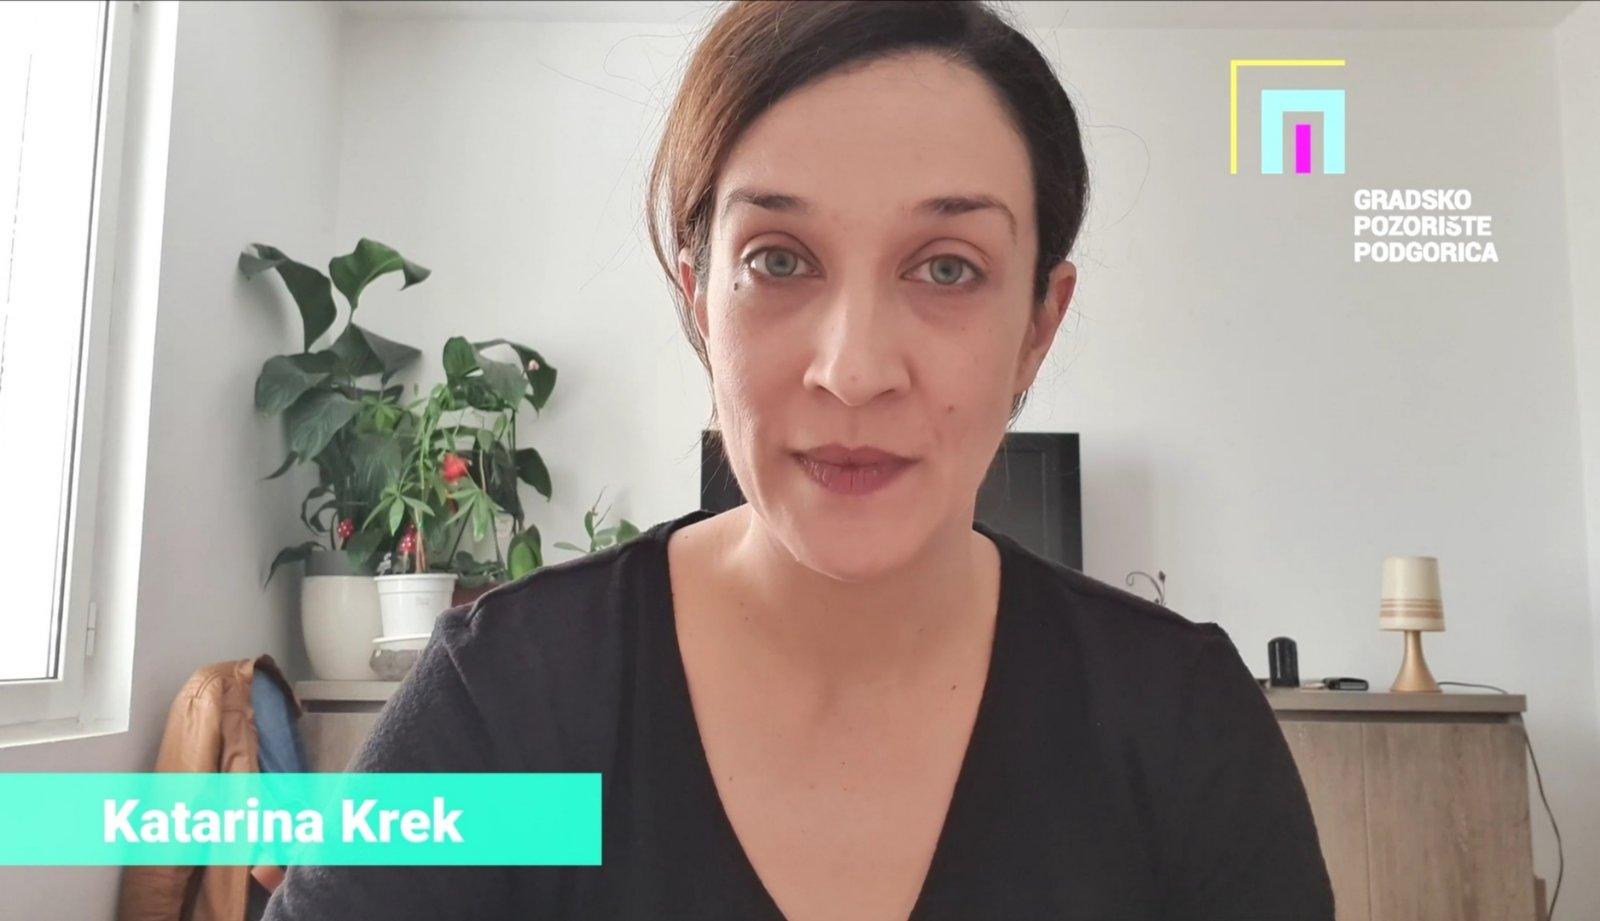 Kampanja #OstaniDoma Katarina Krek